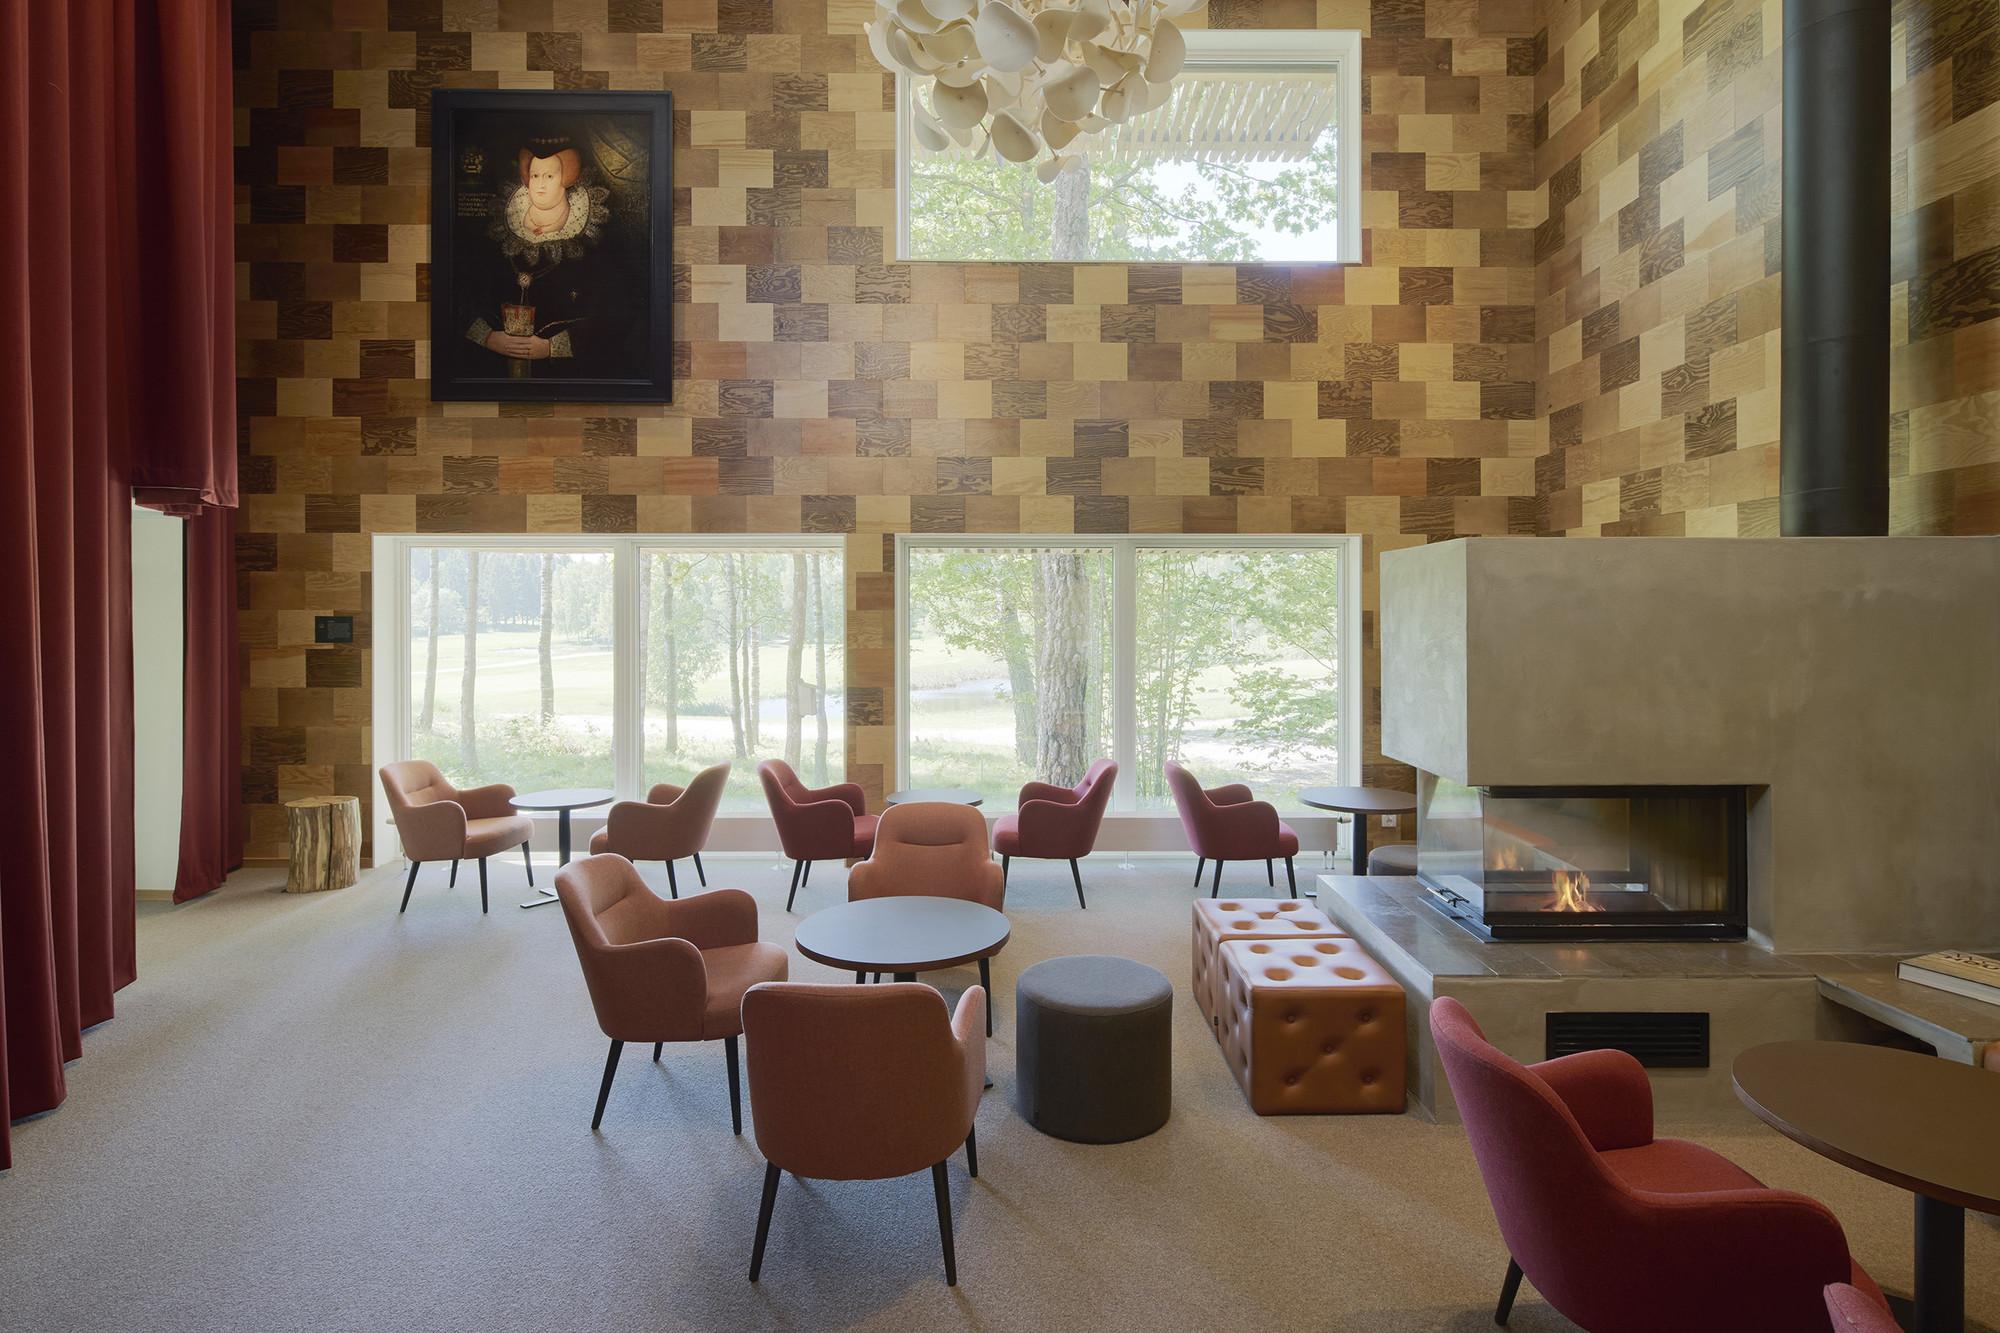 Öijared Hotel / Kjellgren Kaminsky Architecture